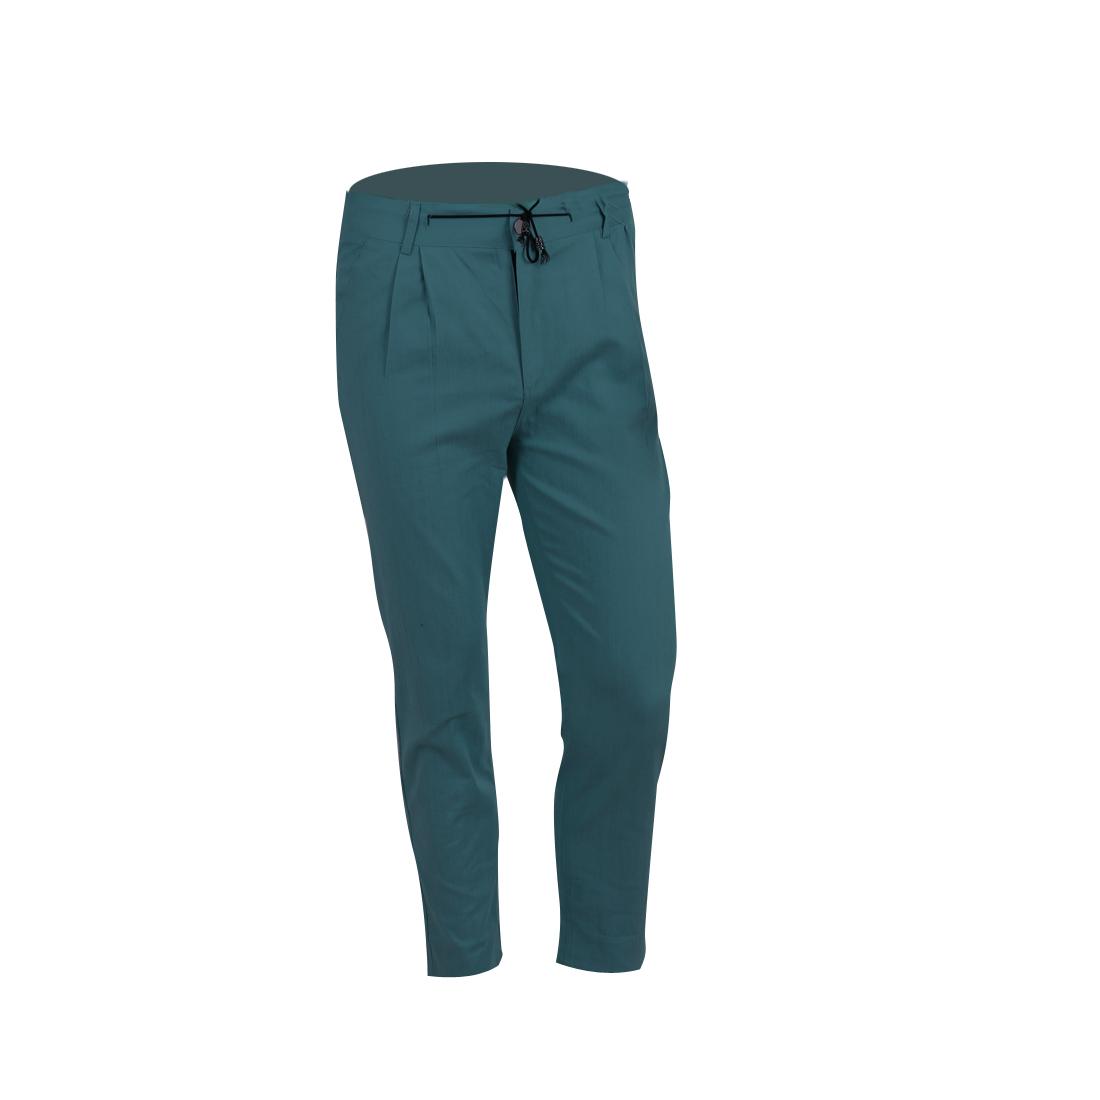 Men Summer Adjustable Strap Waist Pockets Dusty Blue Full-length Pants W30